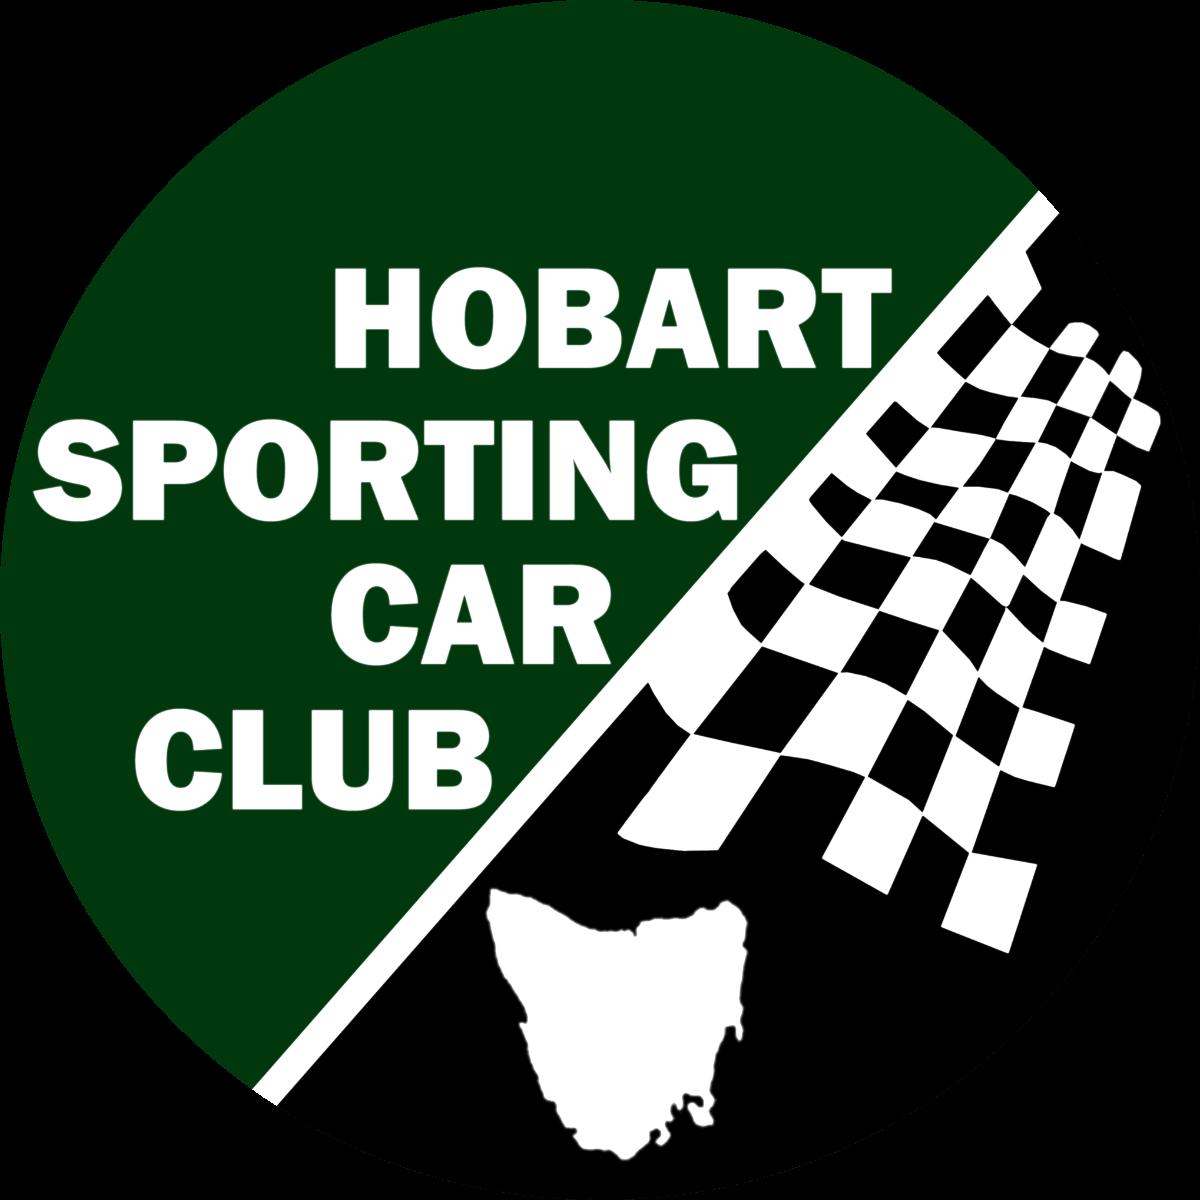 Hobart Sporting Car Club